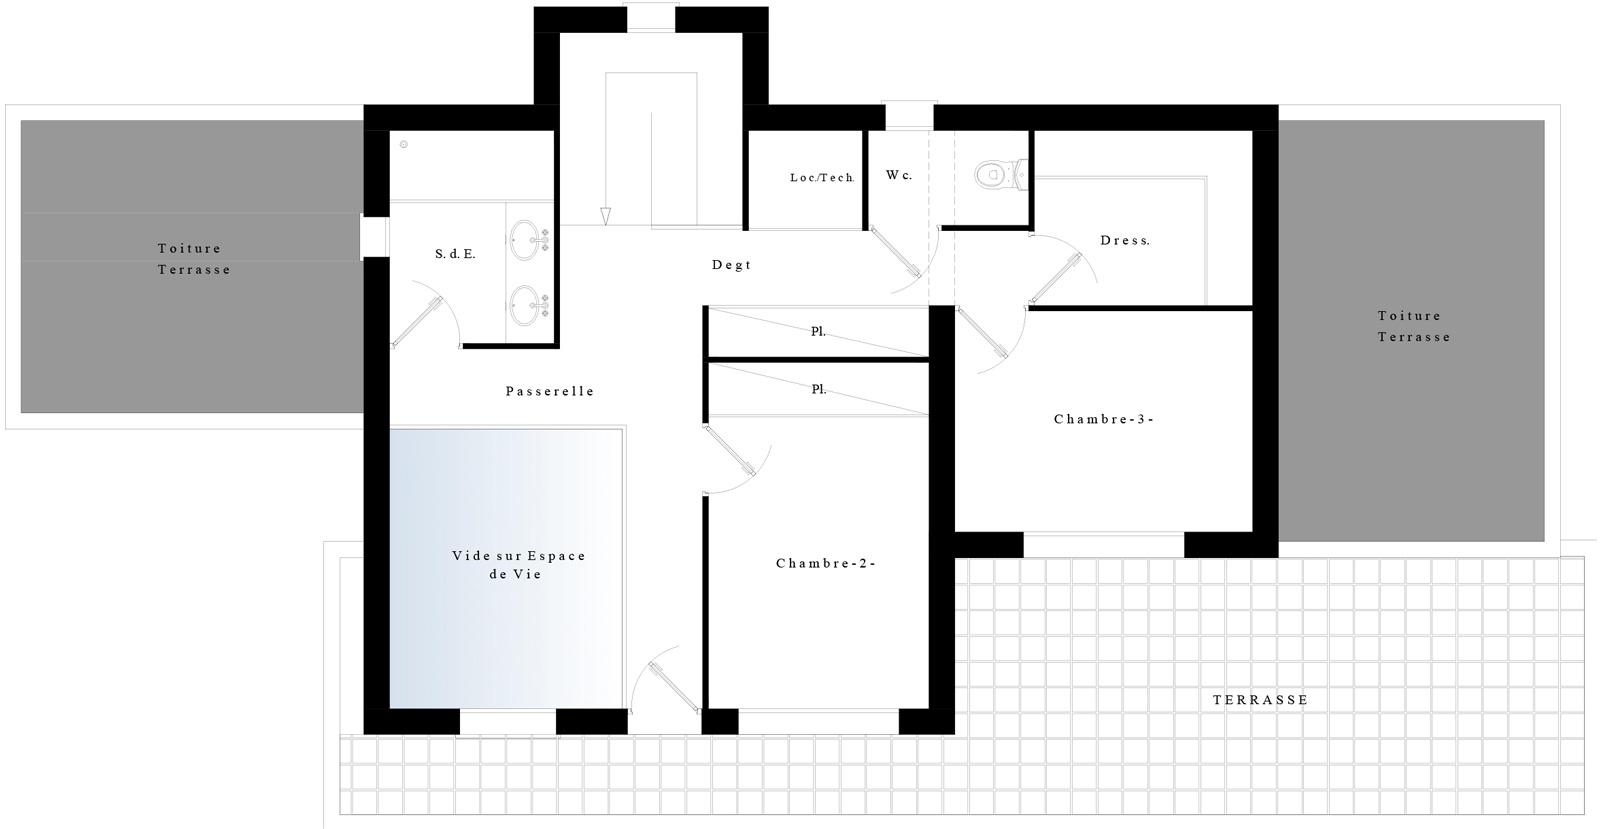 Suntree Villa Concept 4 Plan étage